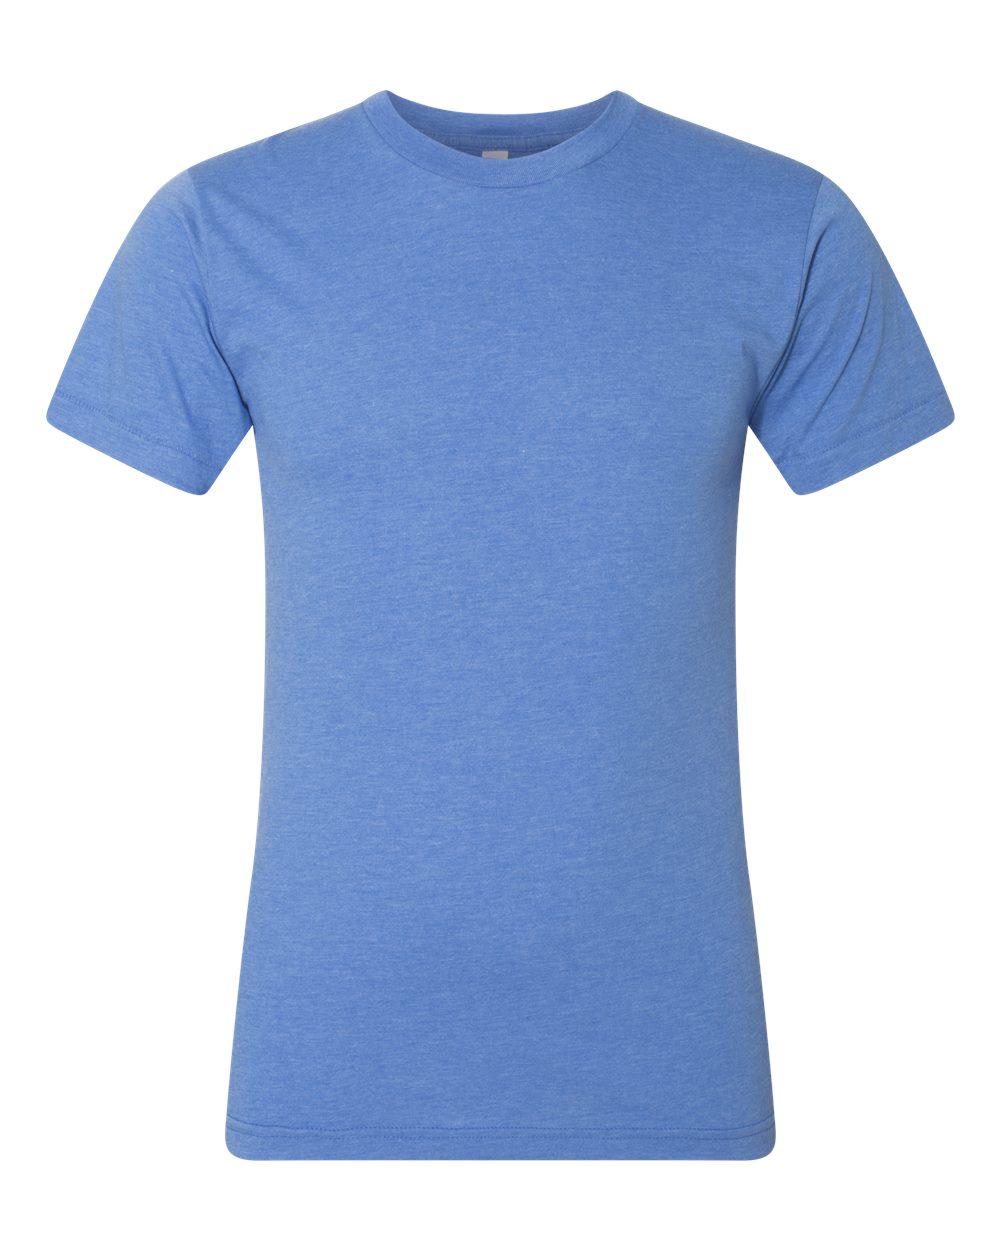 American-Apparel-Mens-Slim-Fit-50-50-Cotton-T-Shirt-Tee-BB401W-up-to-2XL thumbnail 27